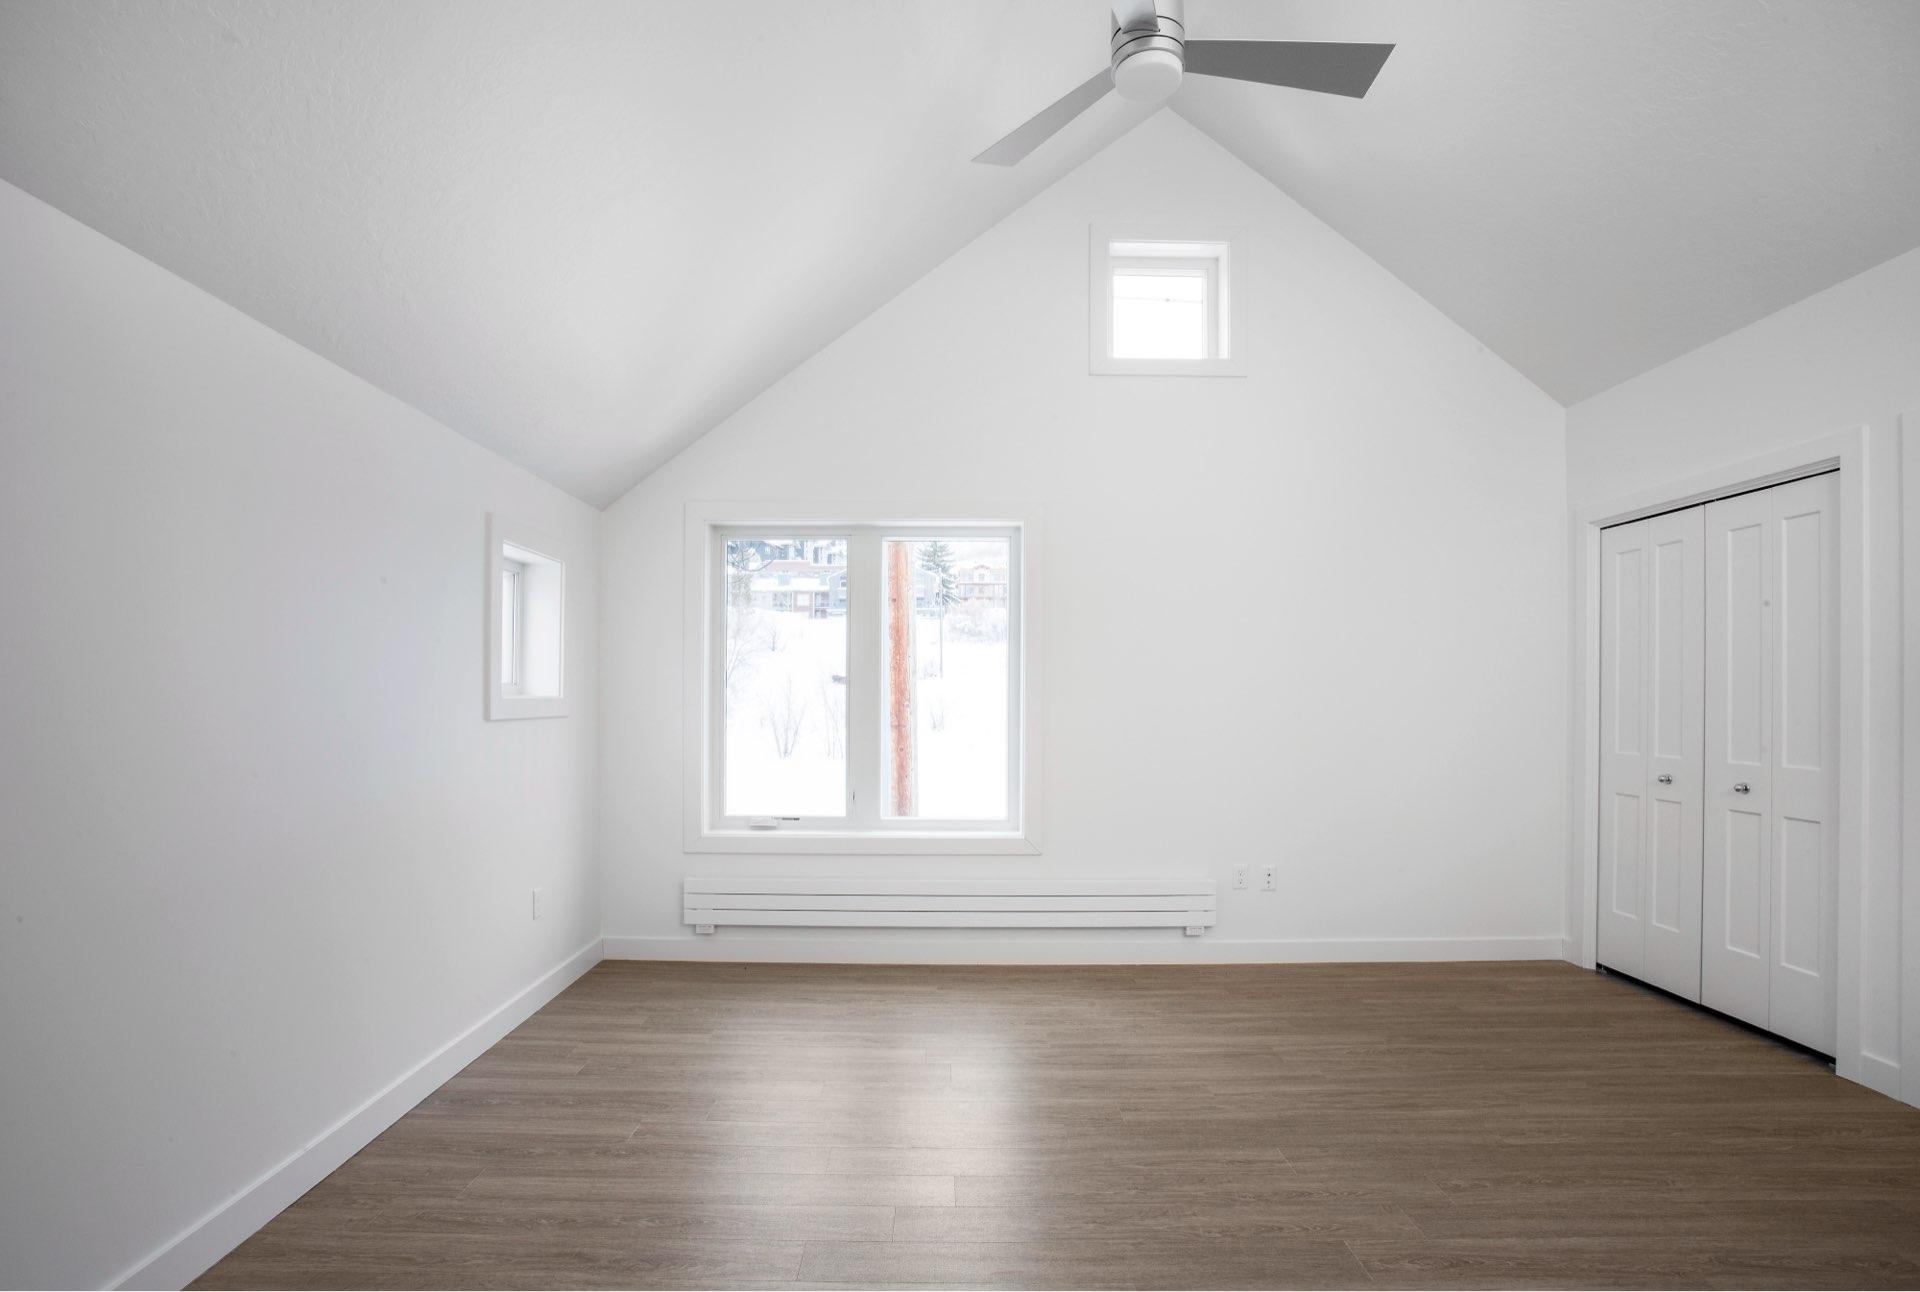 Bedroom, Woodside Park Affordable Housing, architectural design by Elliott Workgroup